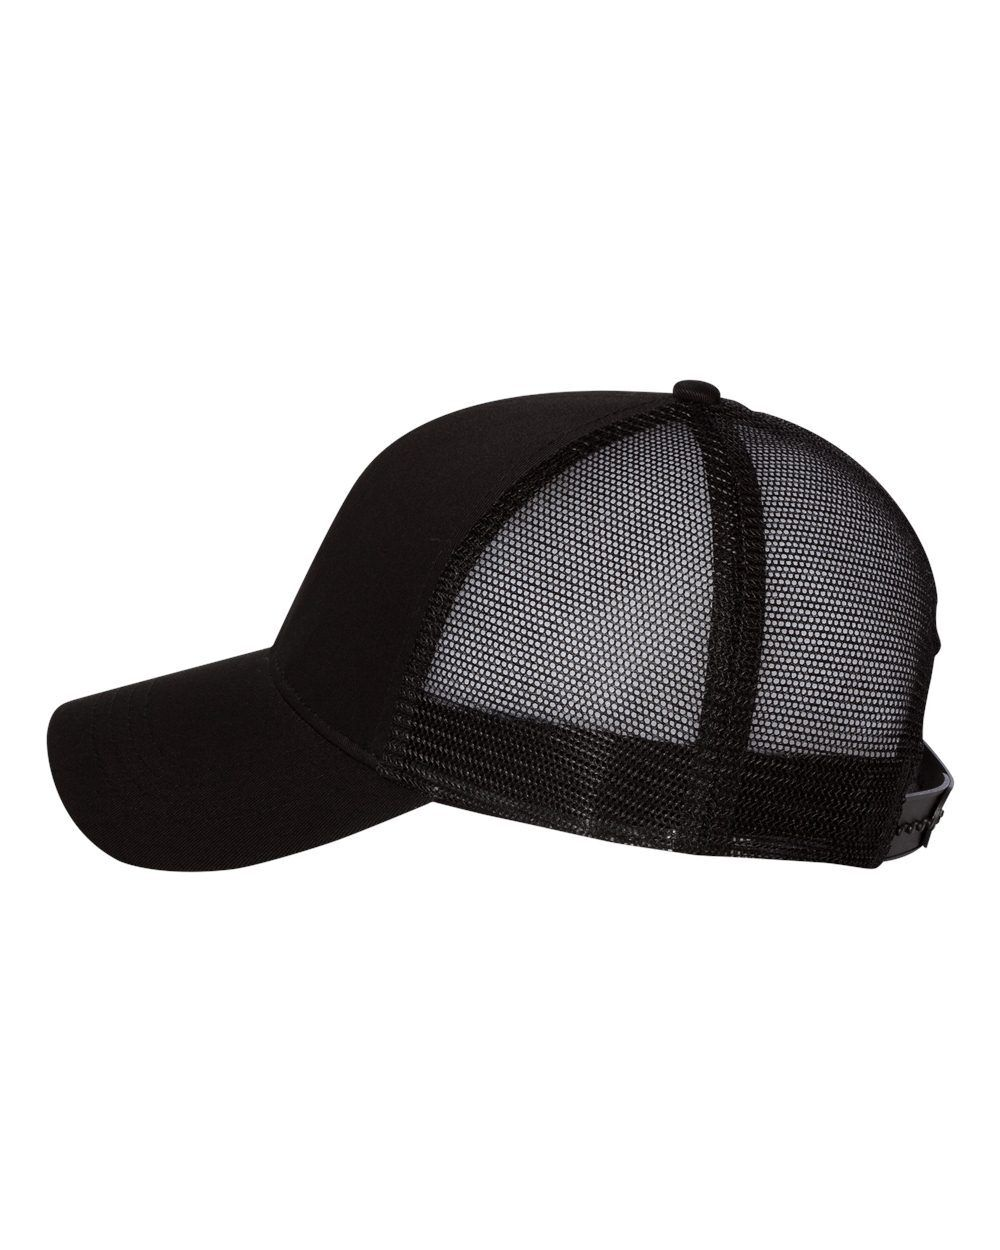 73bc7068 Click to Enlarge. DESCRIpTION. Econscious Re2 Trucker Style Baseball Cap